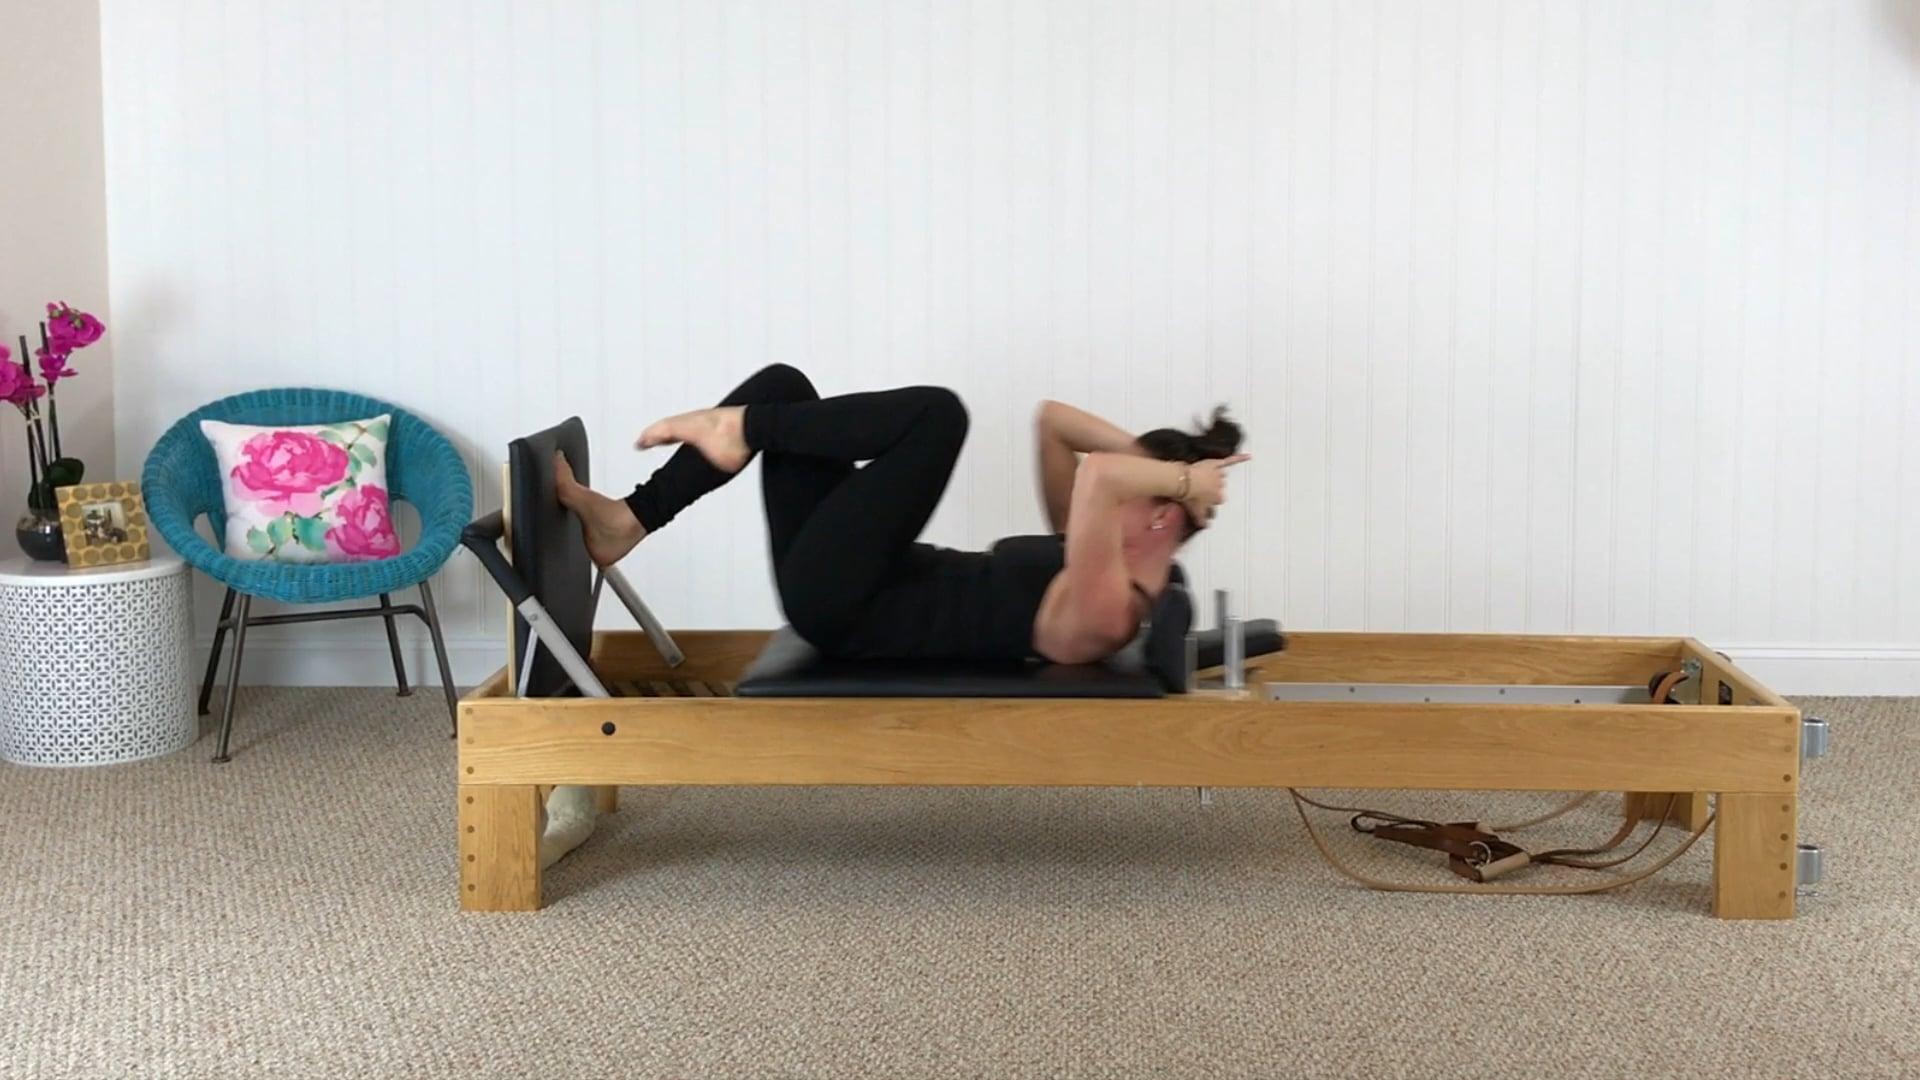 Reformer (10 mins): Jumpboard Cardio